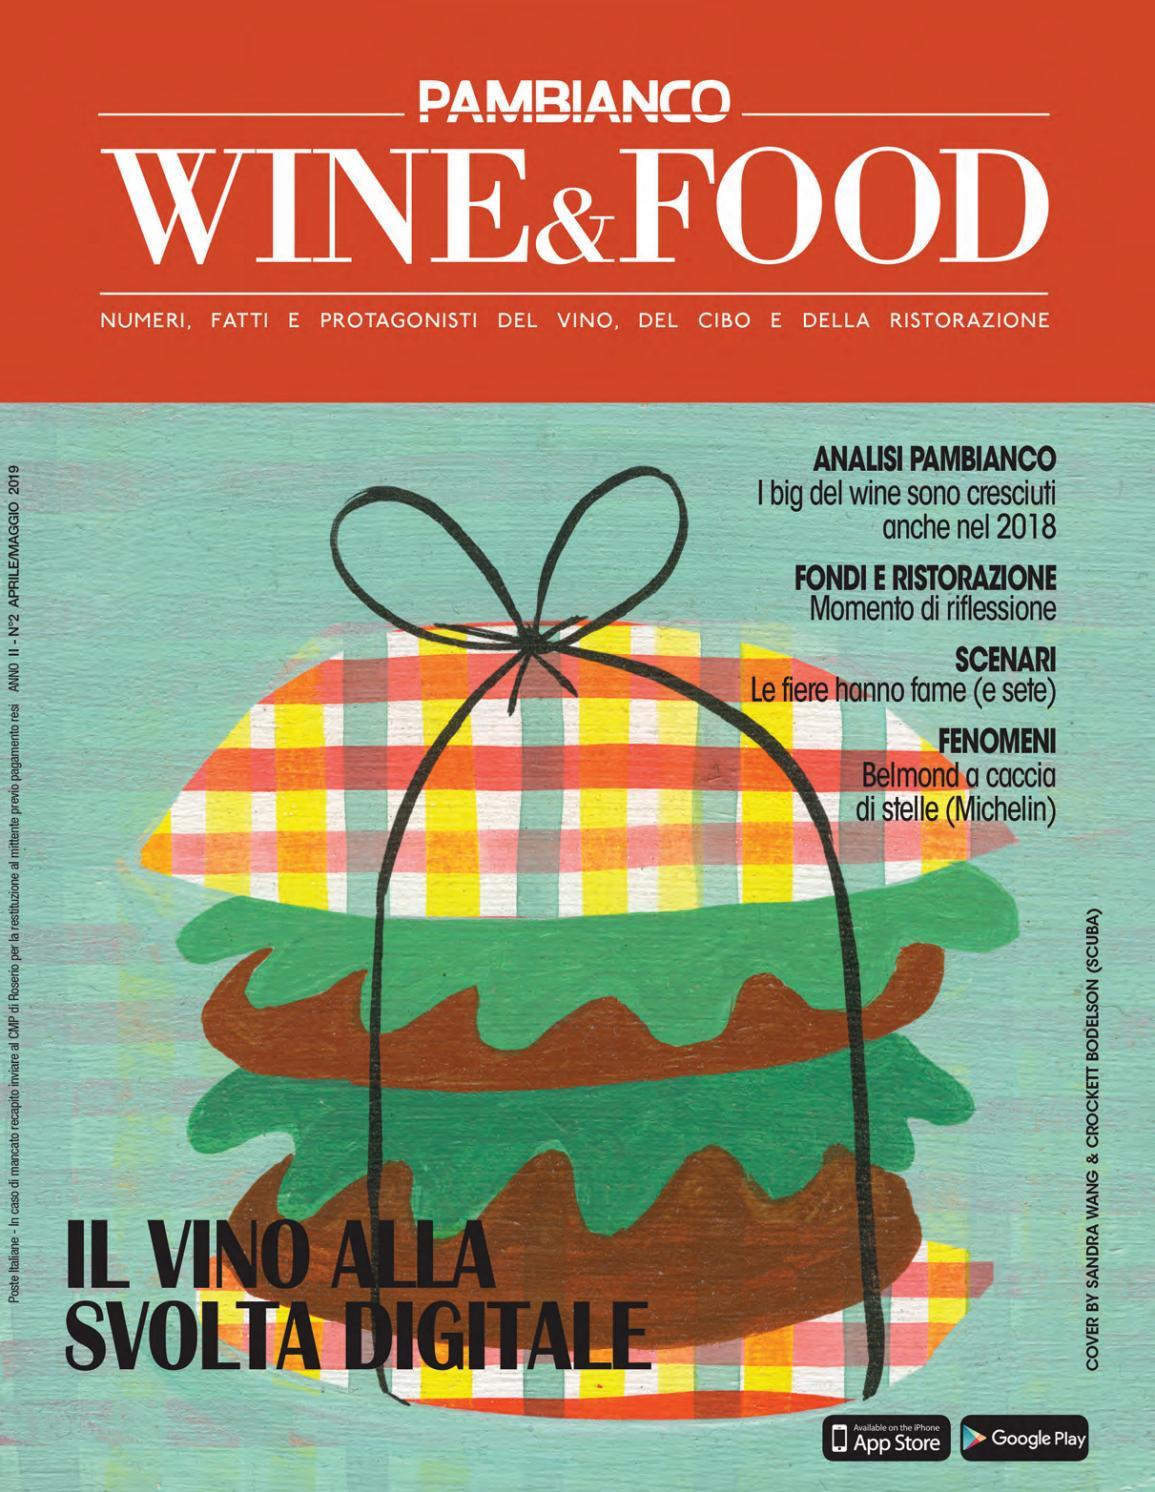 Pambianco wine n°22019 by Pambianconews issuu